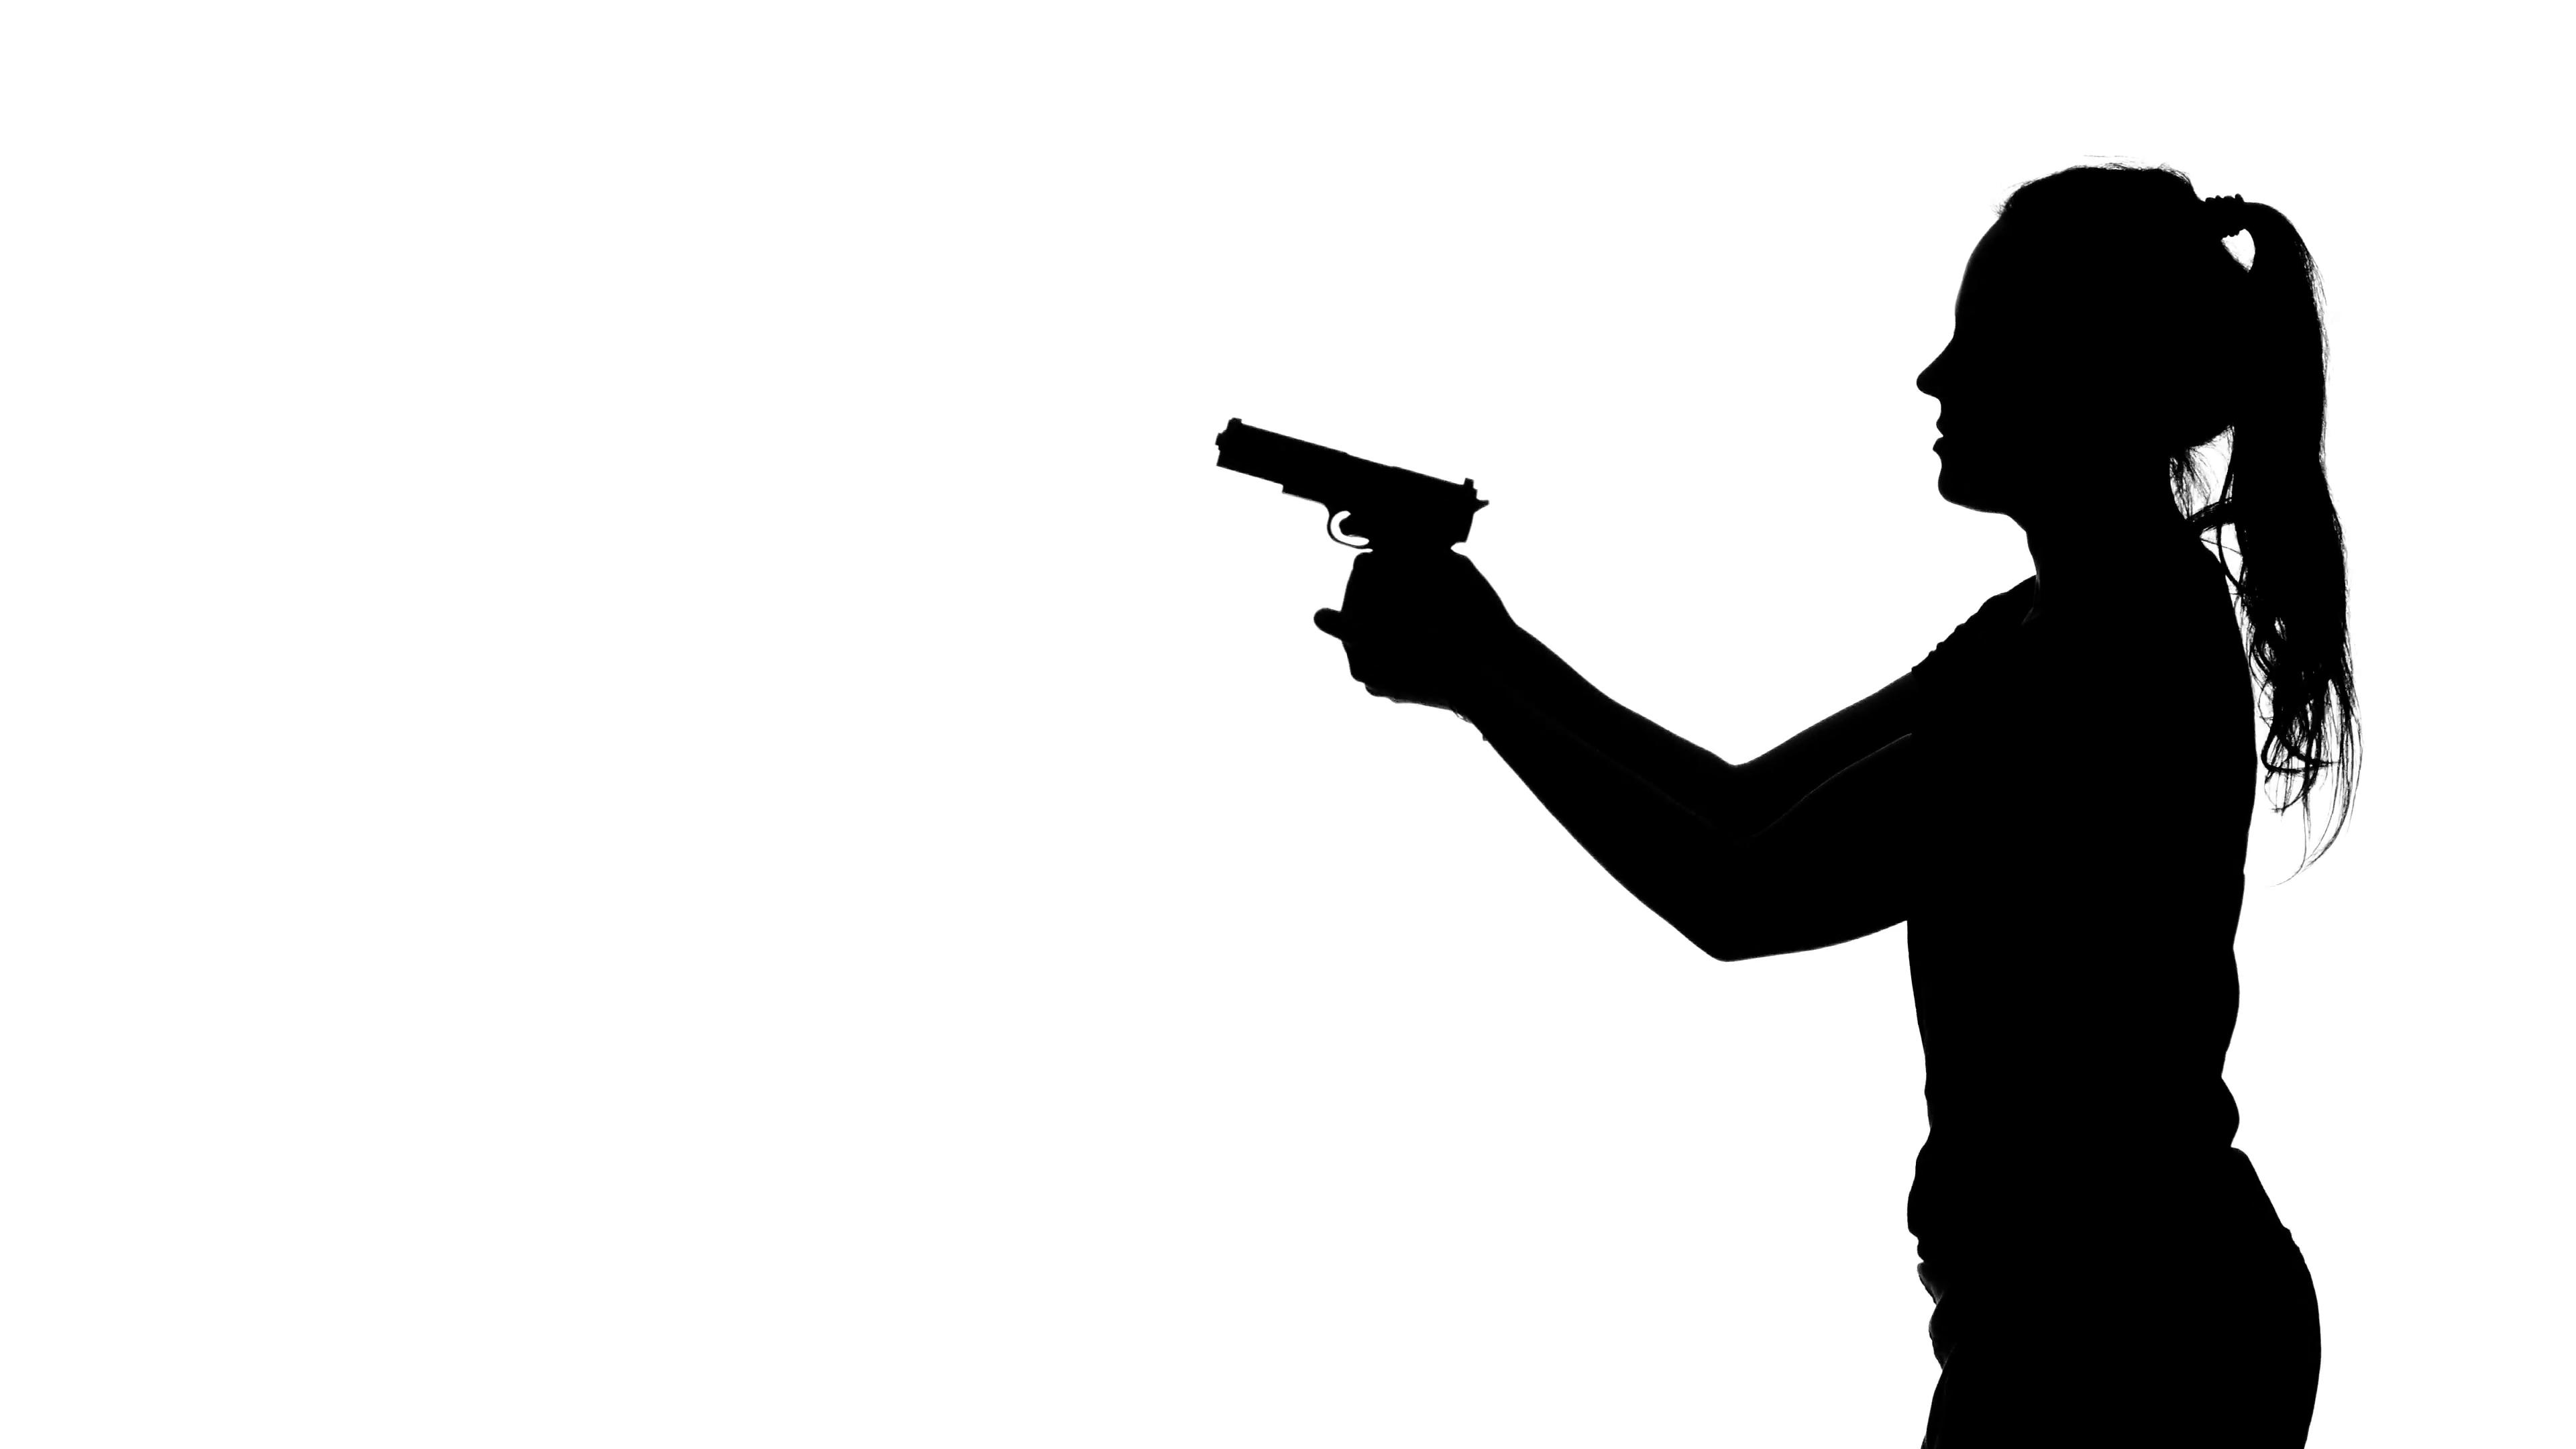 3840x2160 Woman Pointing A Gun. Silhouette. White Stock Video Footage